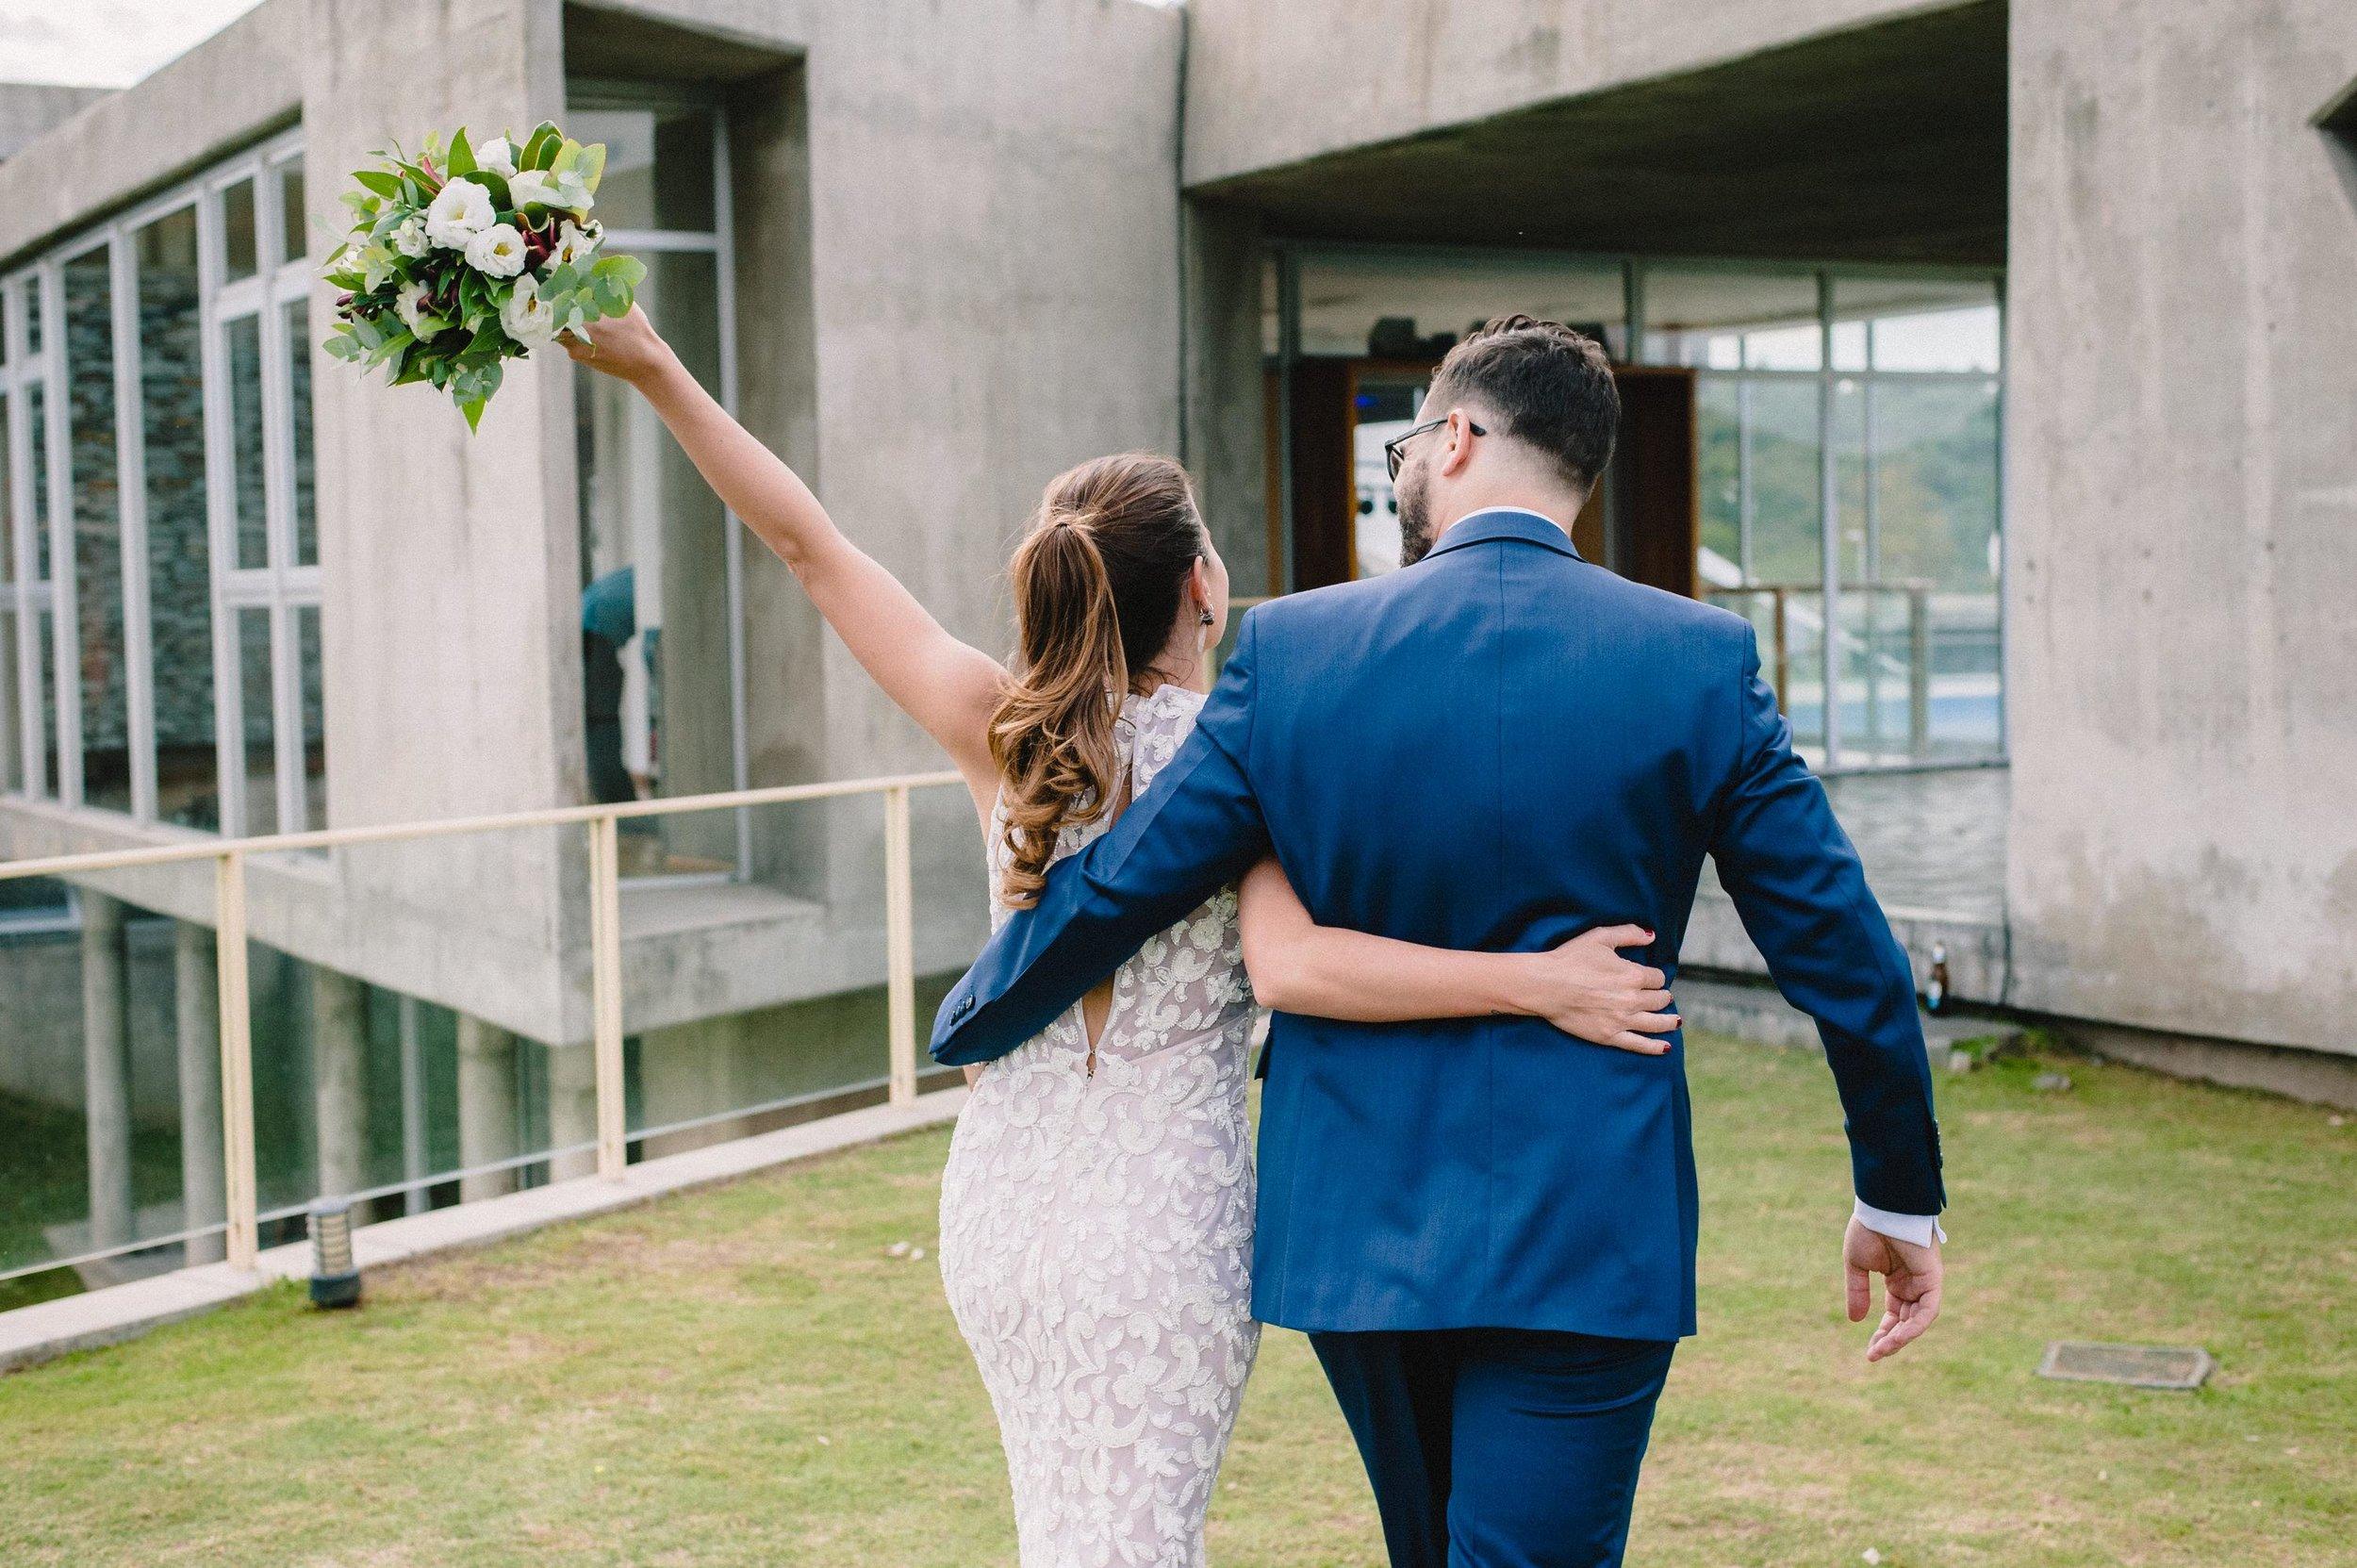 boda en carlos paz 044.JPG